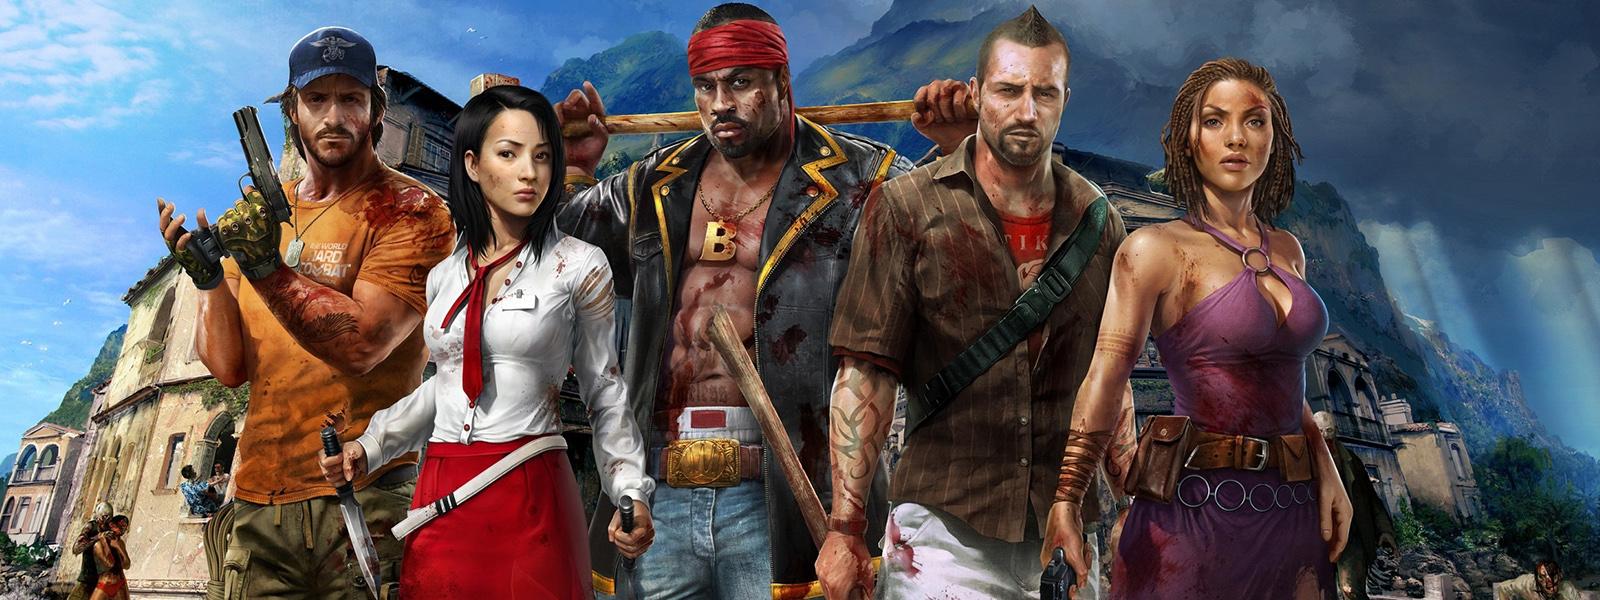 152977_KlzYCUAEhe_dead_island_riptide_video_game_1.jpg